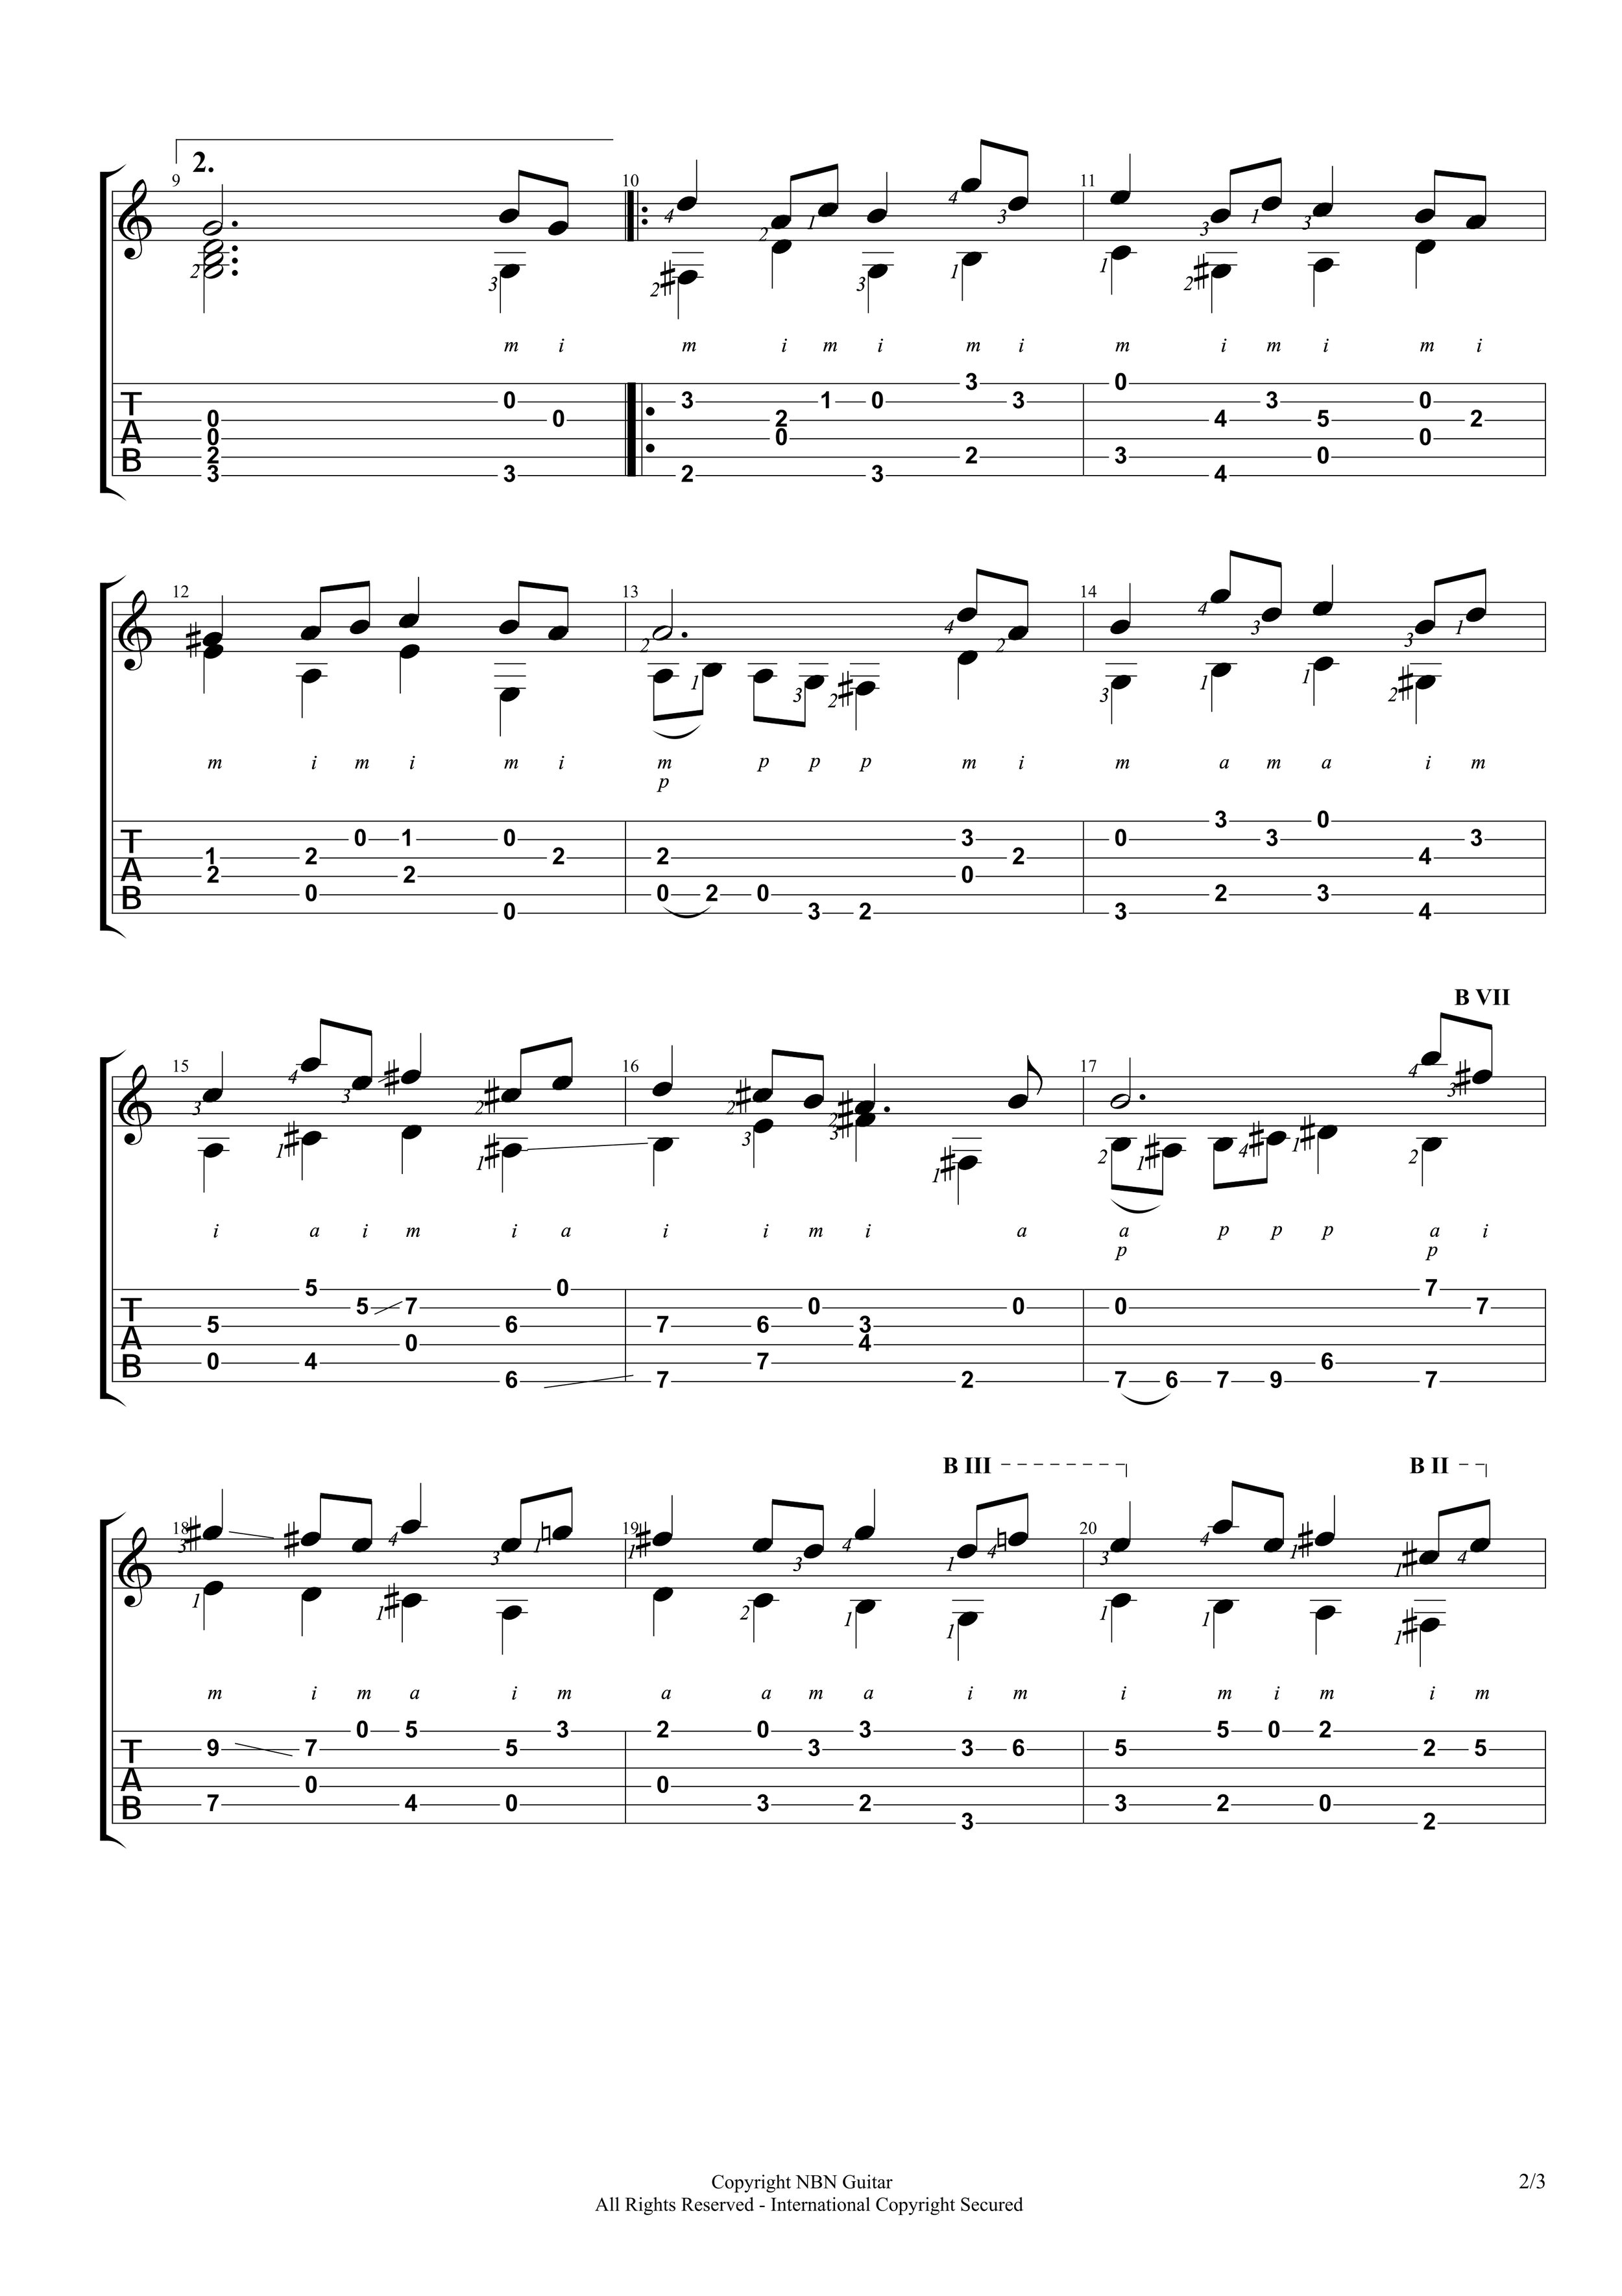 Bourrée in E-minor BWV996 (Sheet Music & Tabs)-p4.jpg